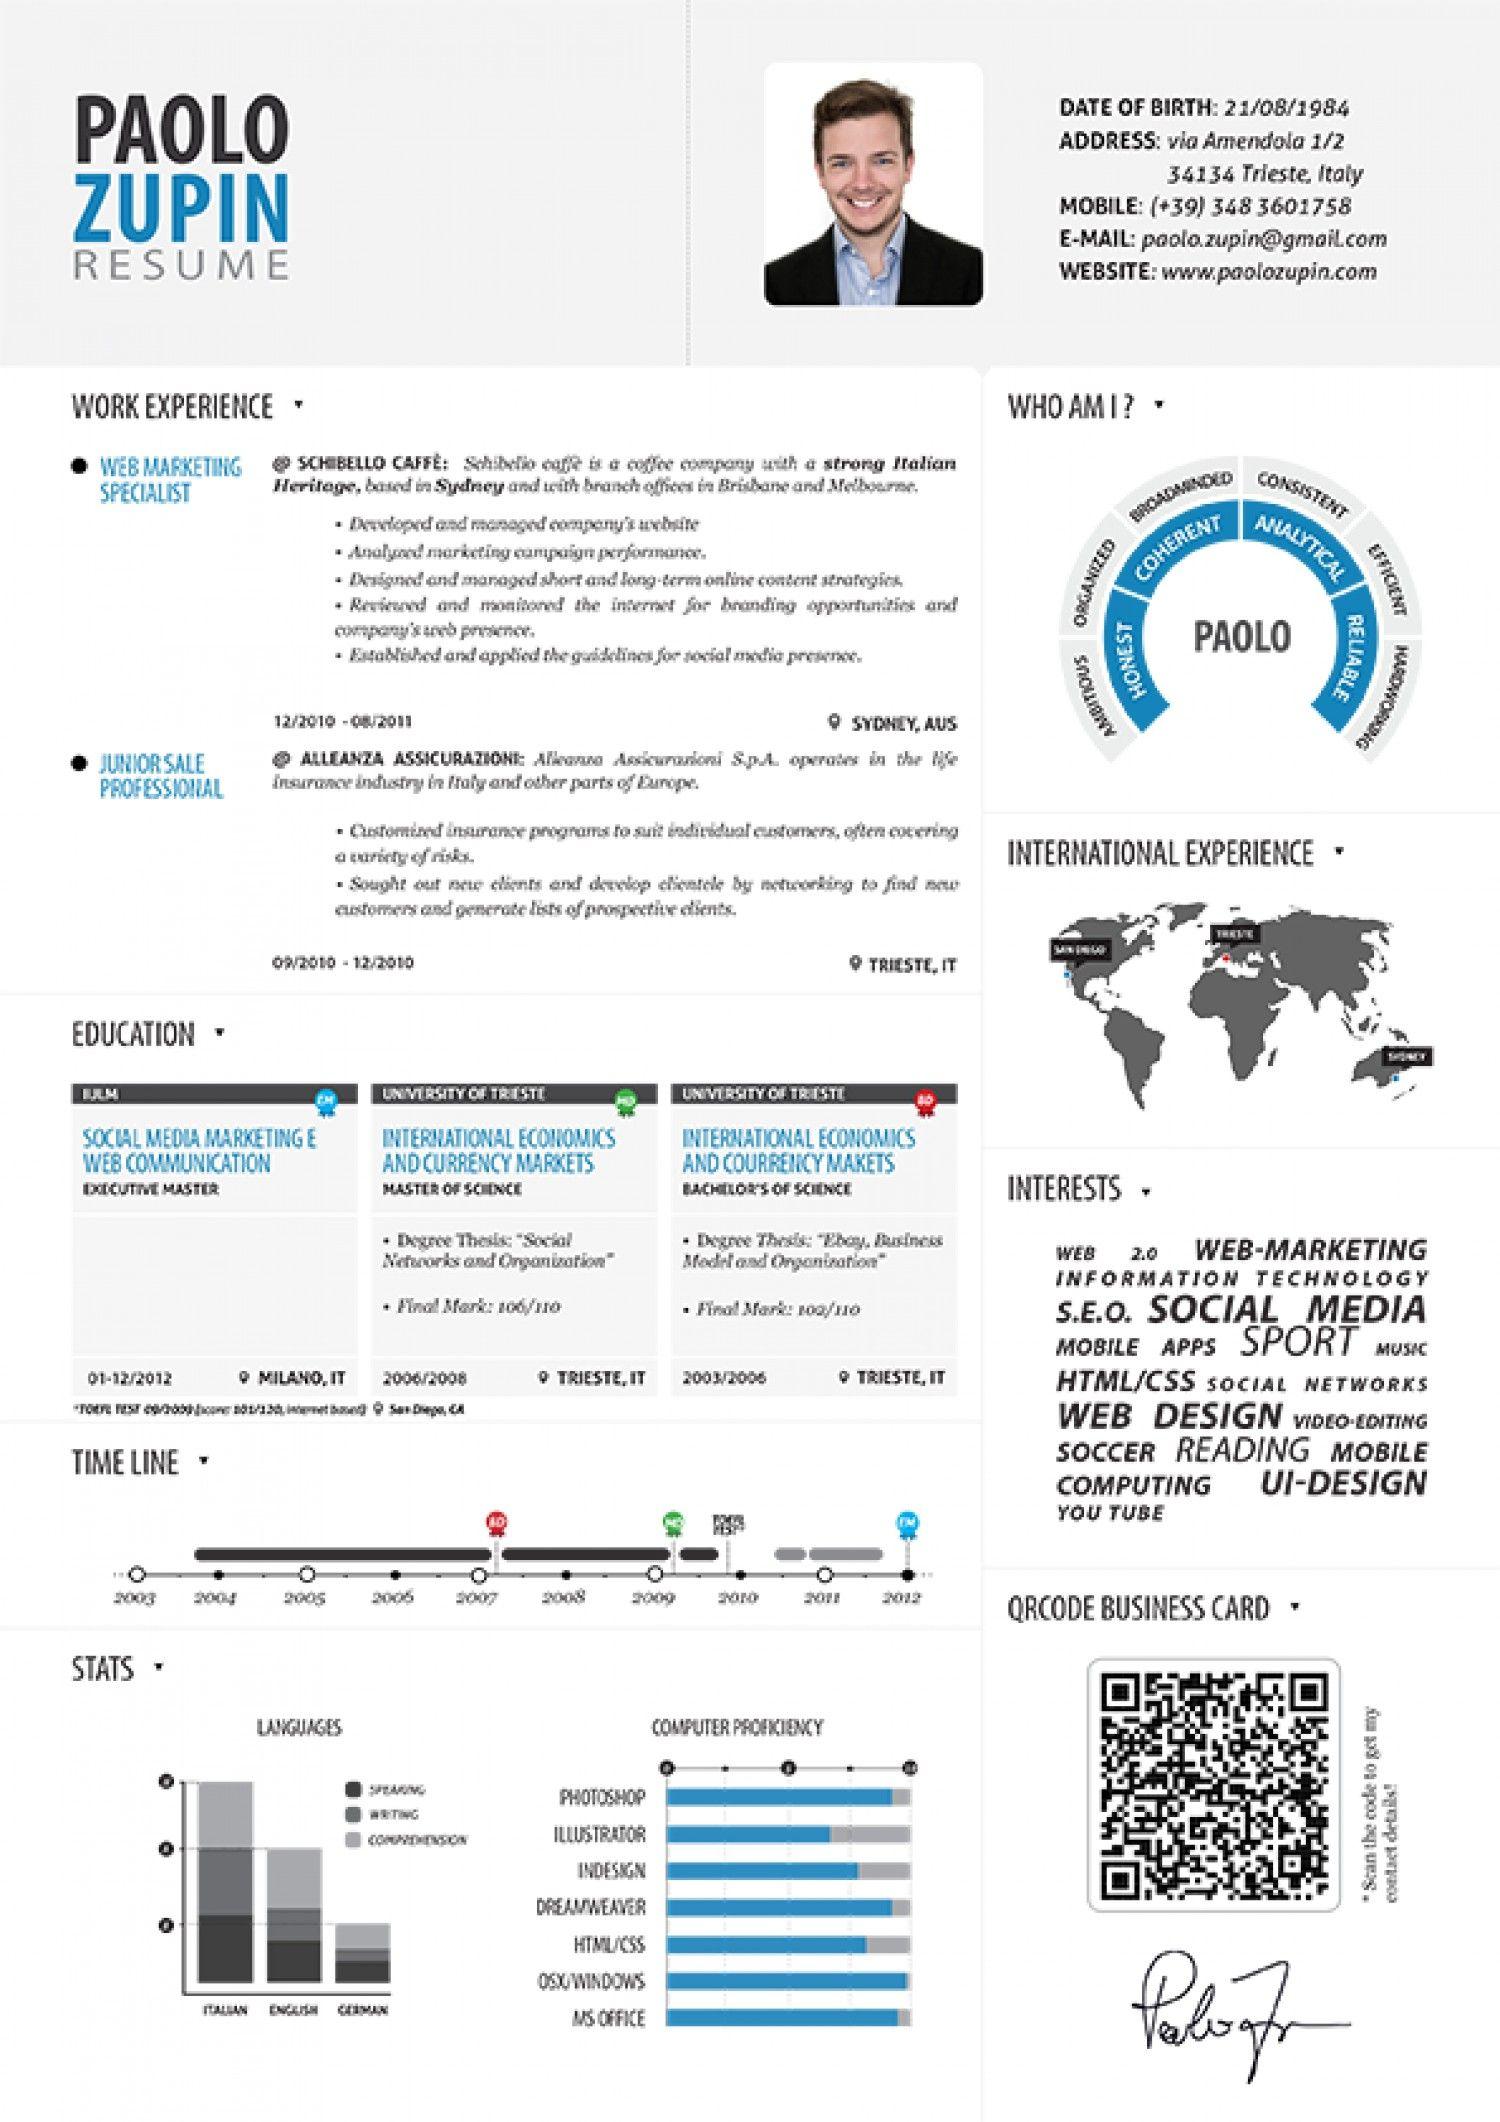 Paolo Zupin Infographic Resume Visual Ly Curriculum Vitae Modele Cv Gratuit Modele De Cv Creatif